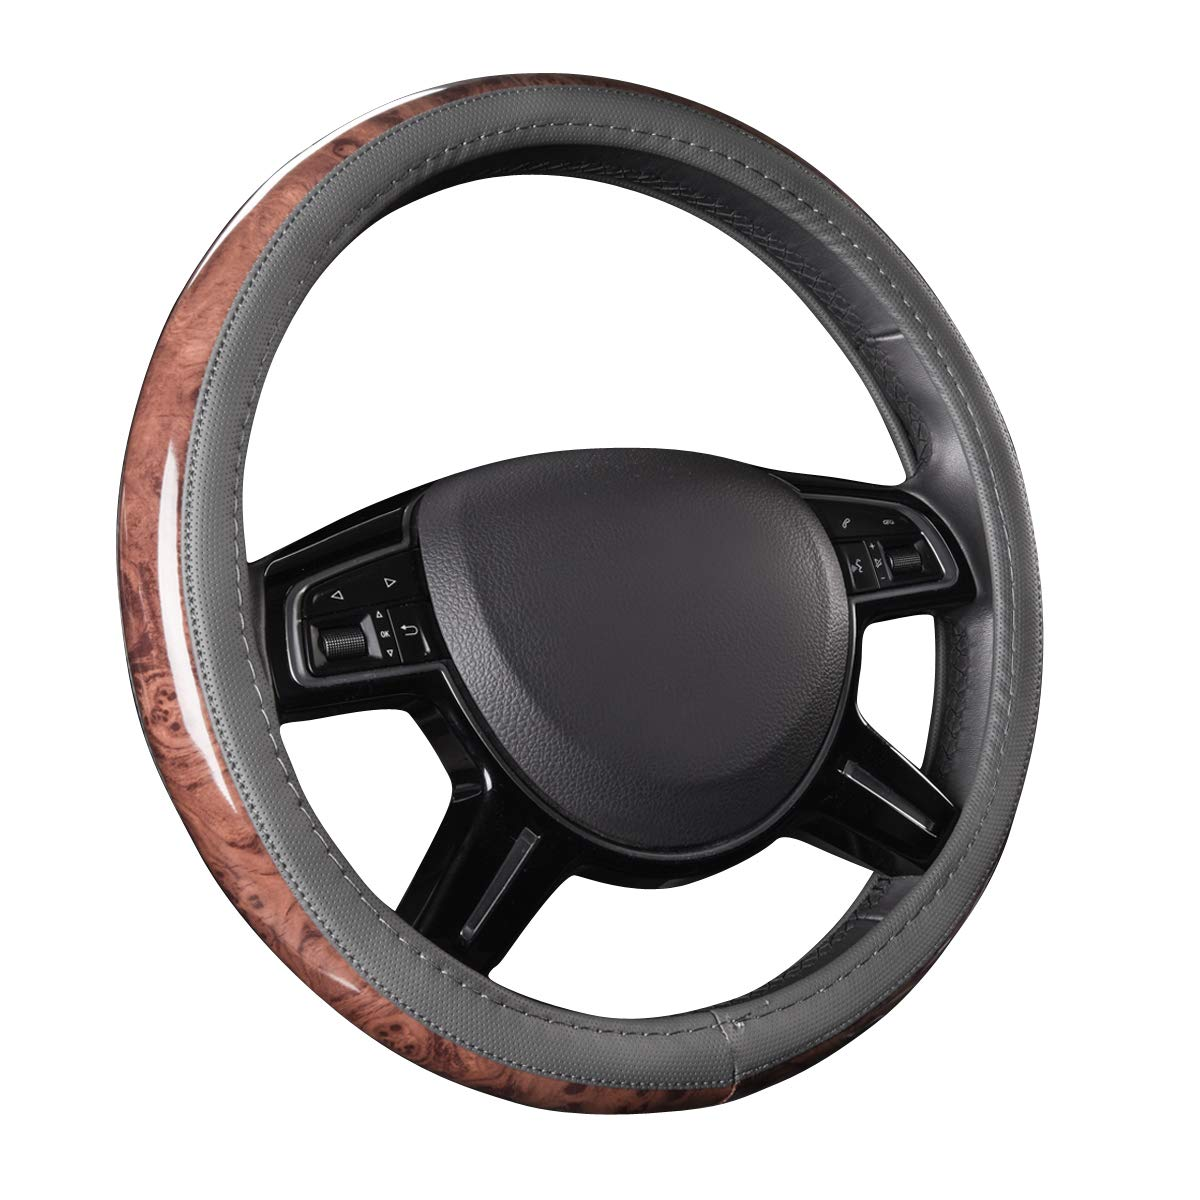 CAR PASS Universal Fit Full Wood Grain Leather Steering Wheel Covers Fit for Suvs,Trucks,Sedans, Anti-Slip Design …(Gray)